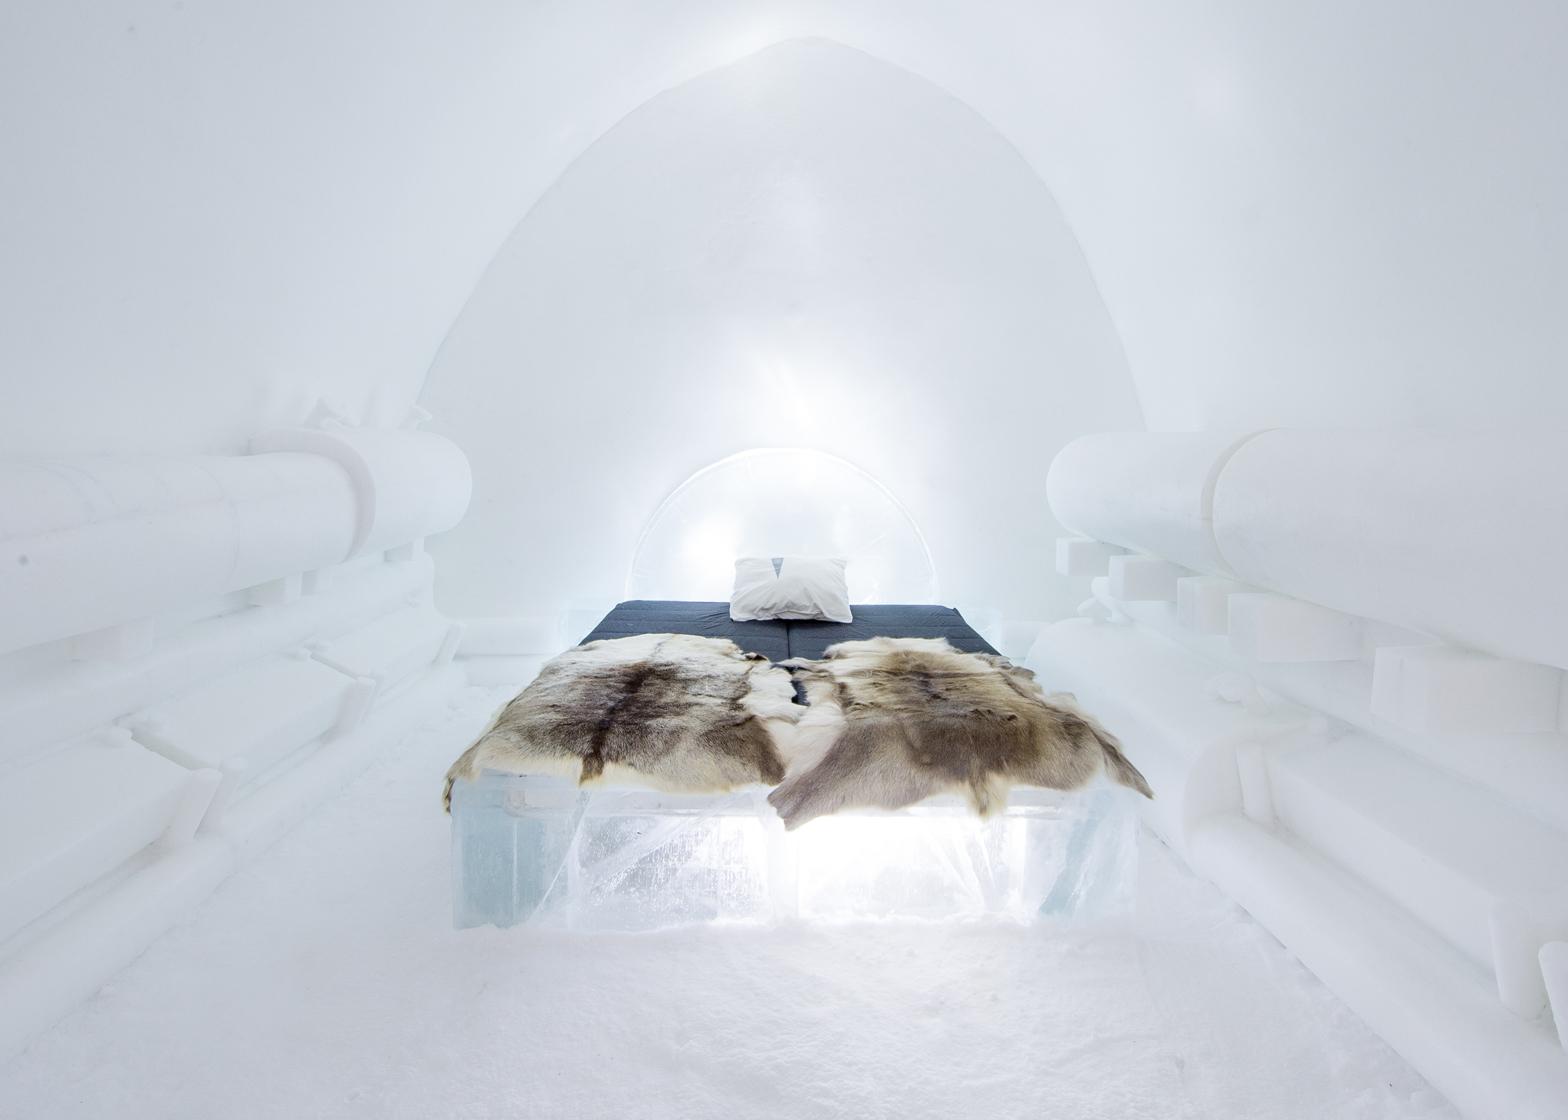 architecture-ice-hotel-design-studia-interiors-osnovadesign-osnova-poltava-03